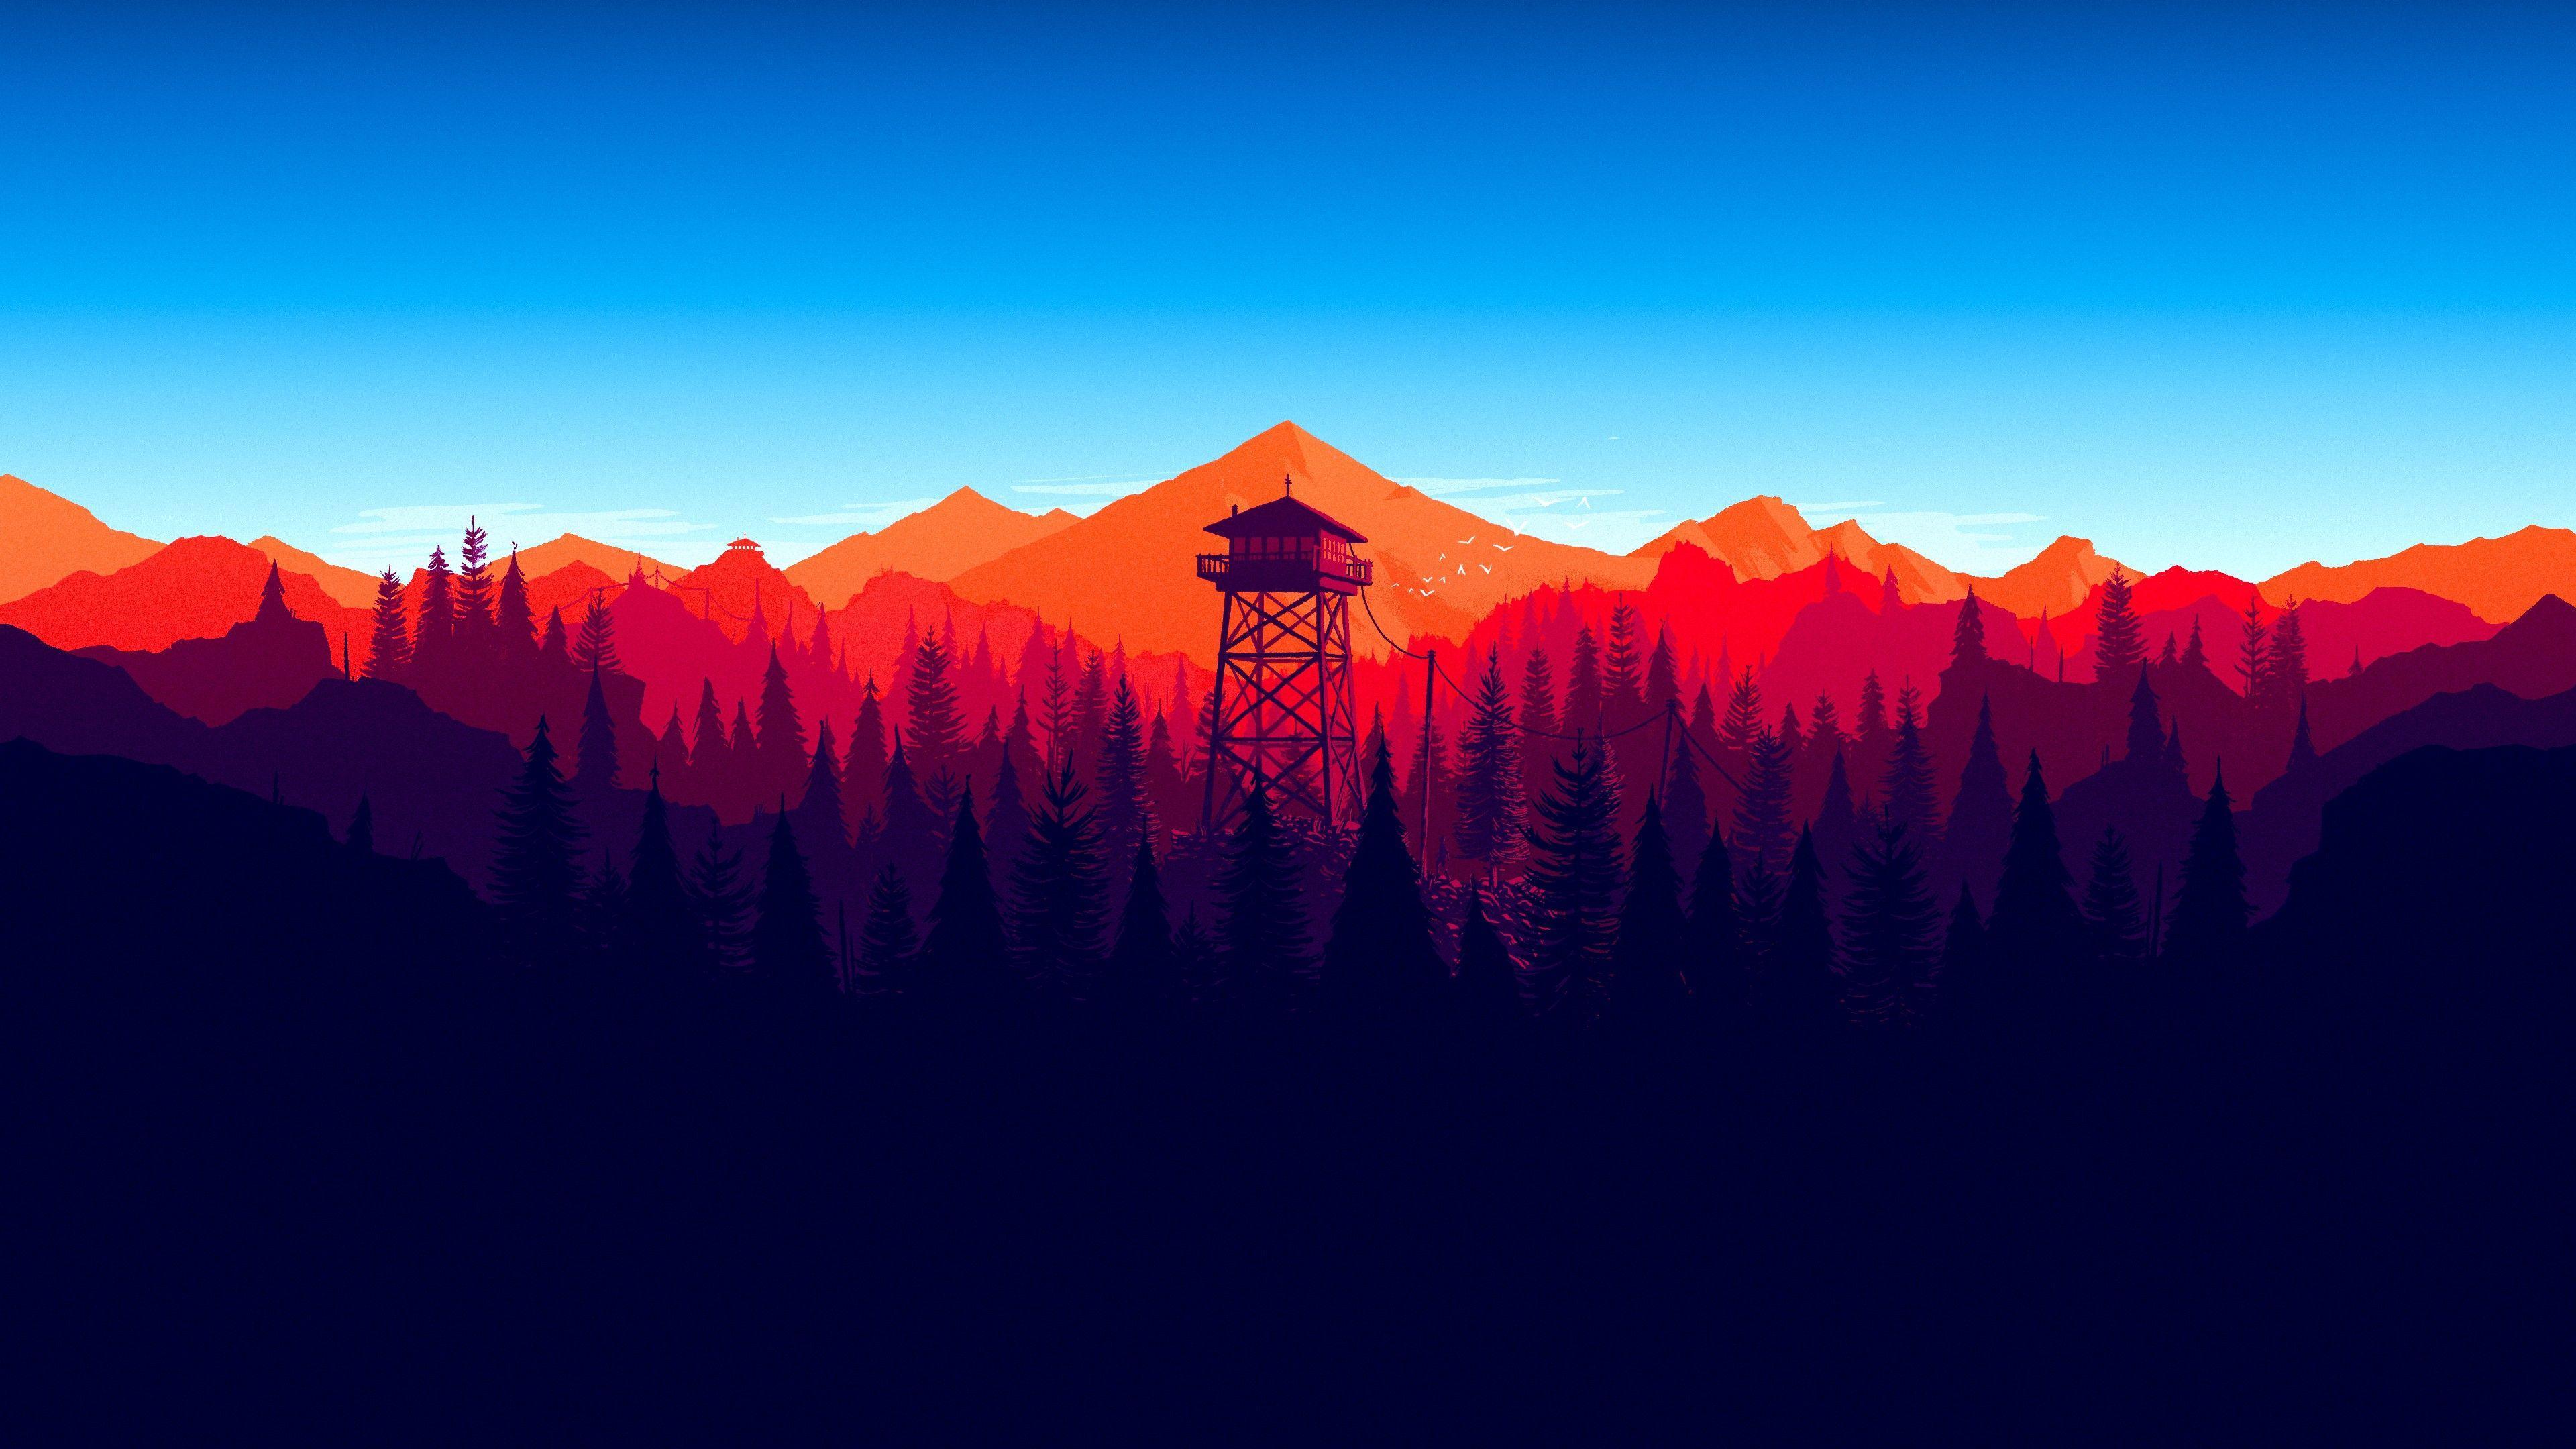 4k Desktop Wallpapers Top Free 4k Desktop Backgrounds Wallpaperaccess